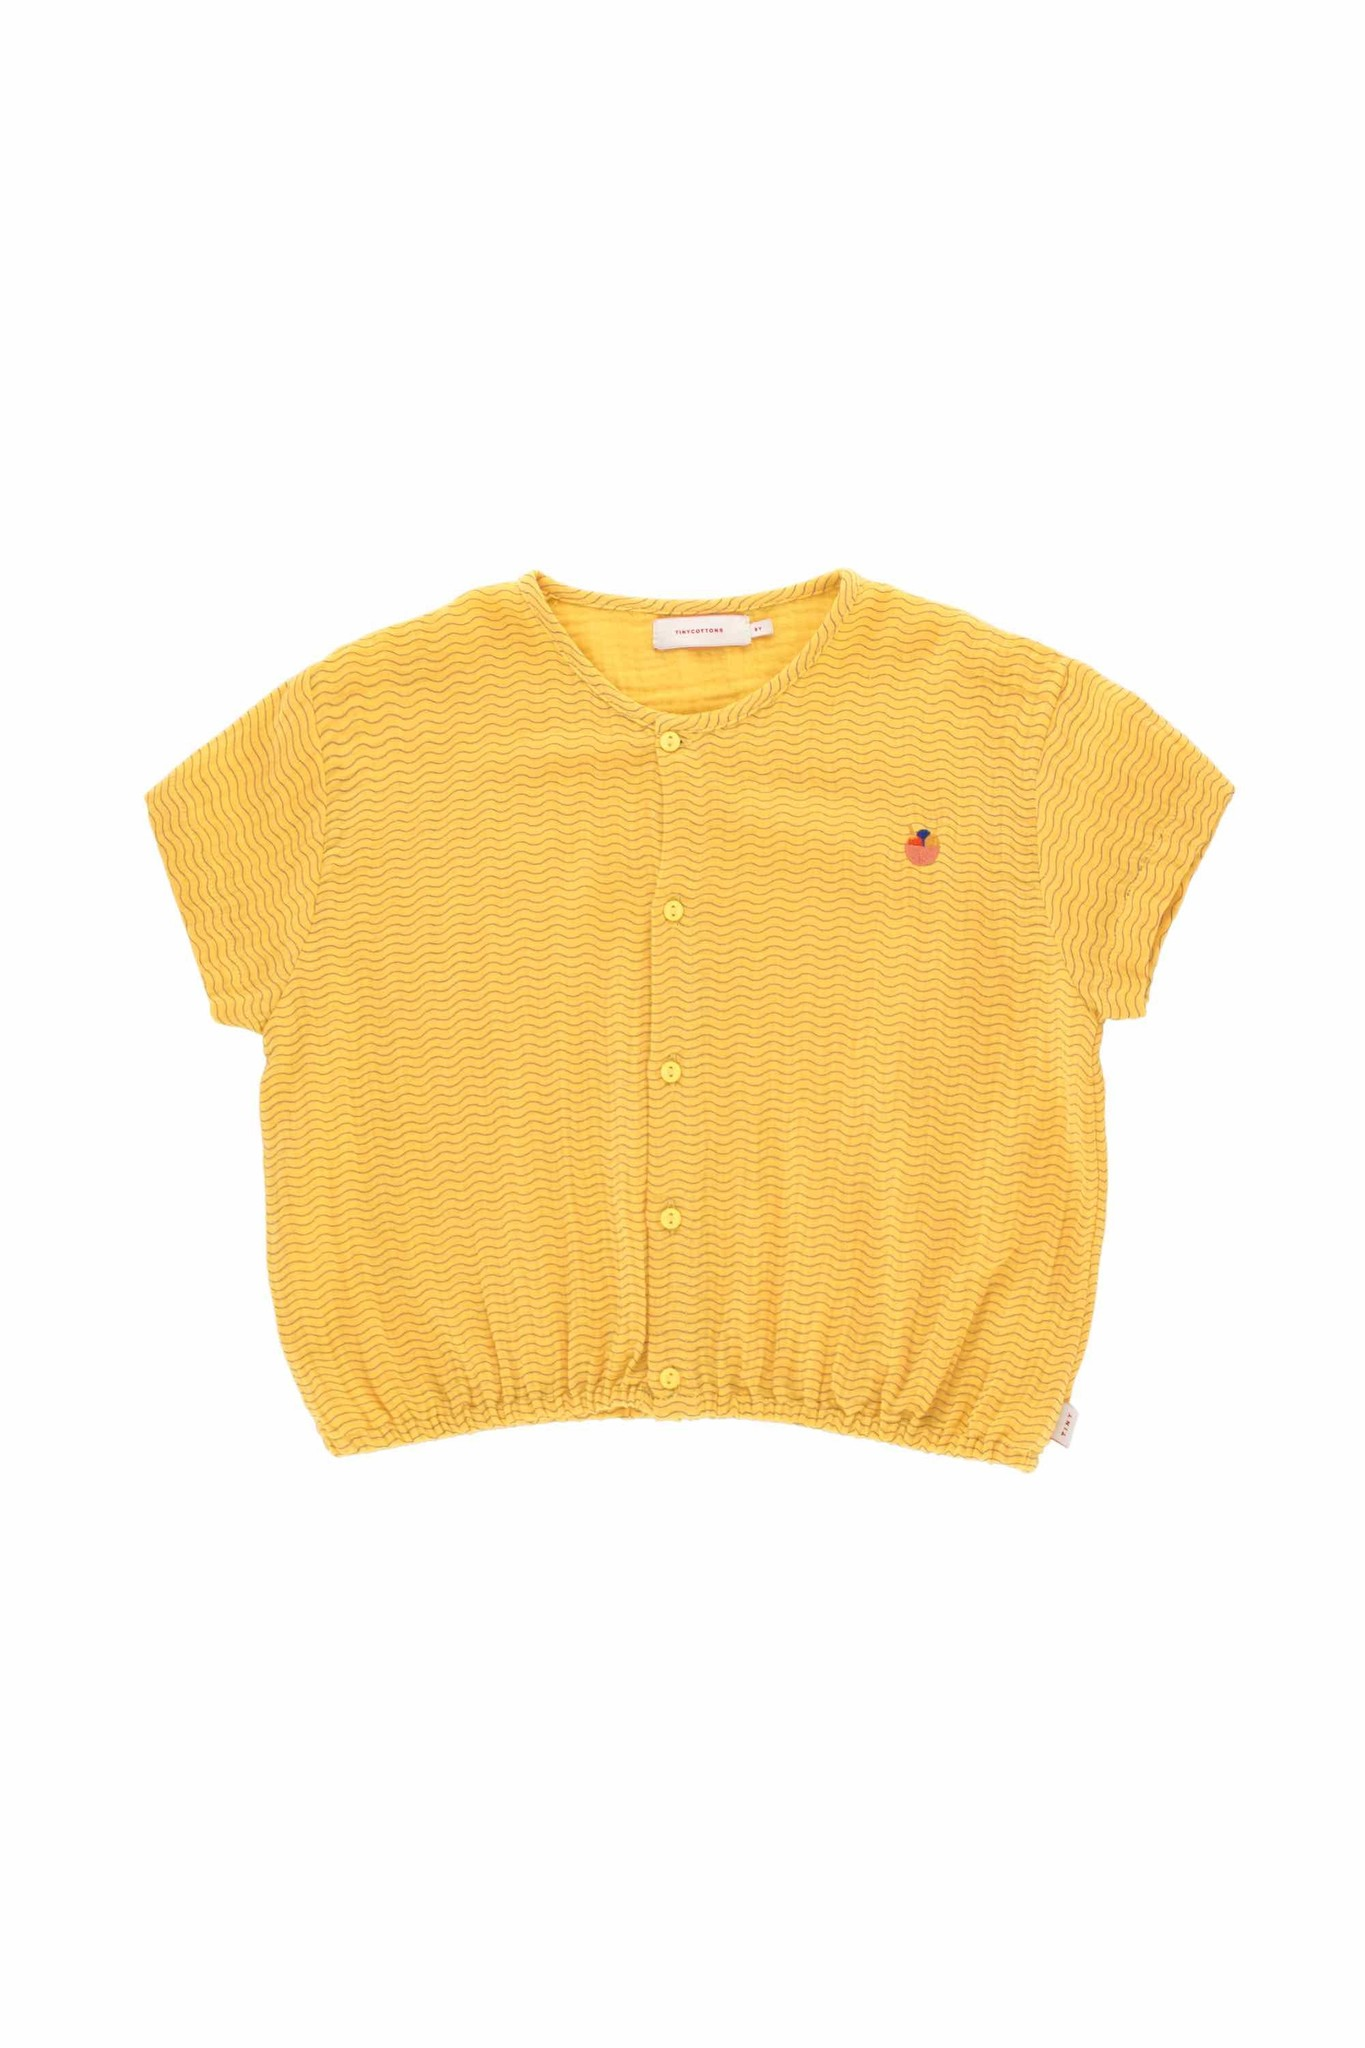 Waves crop shirt - Yellow /Iris Blue-1